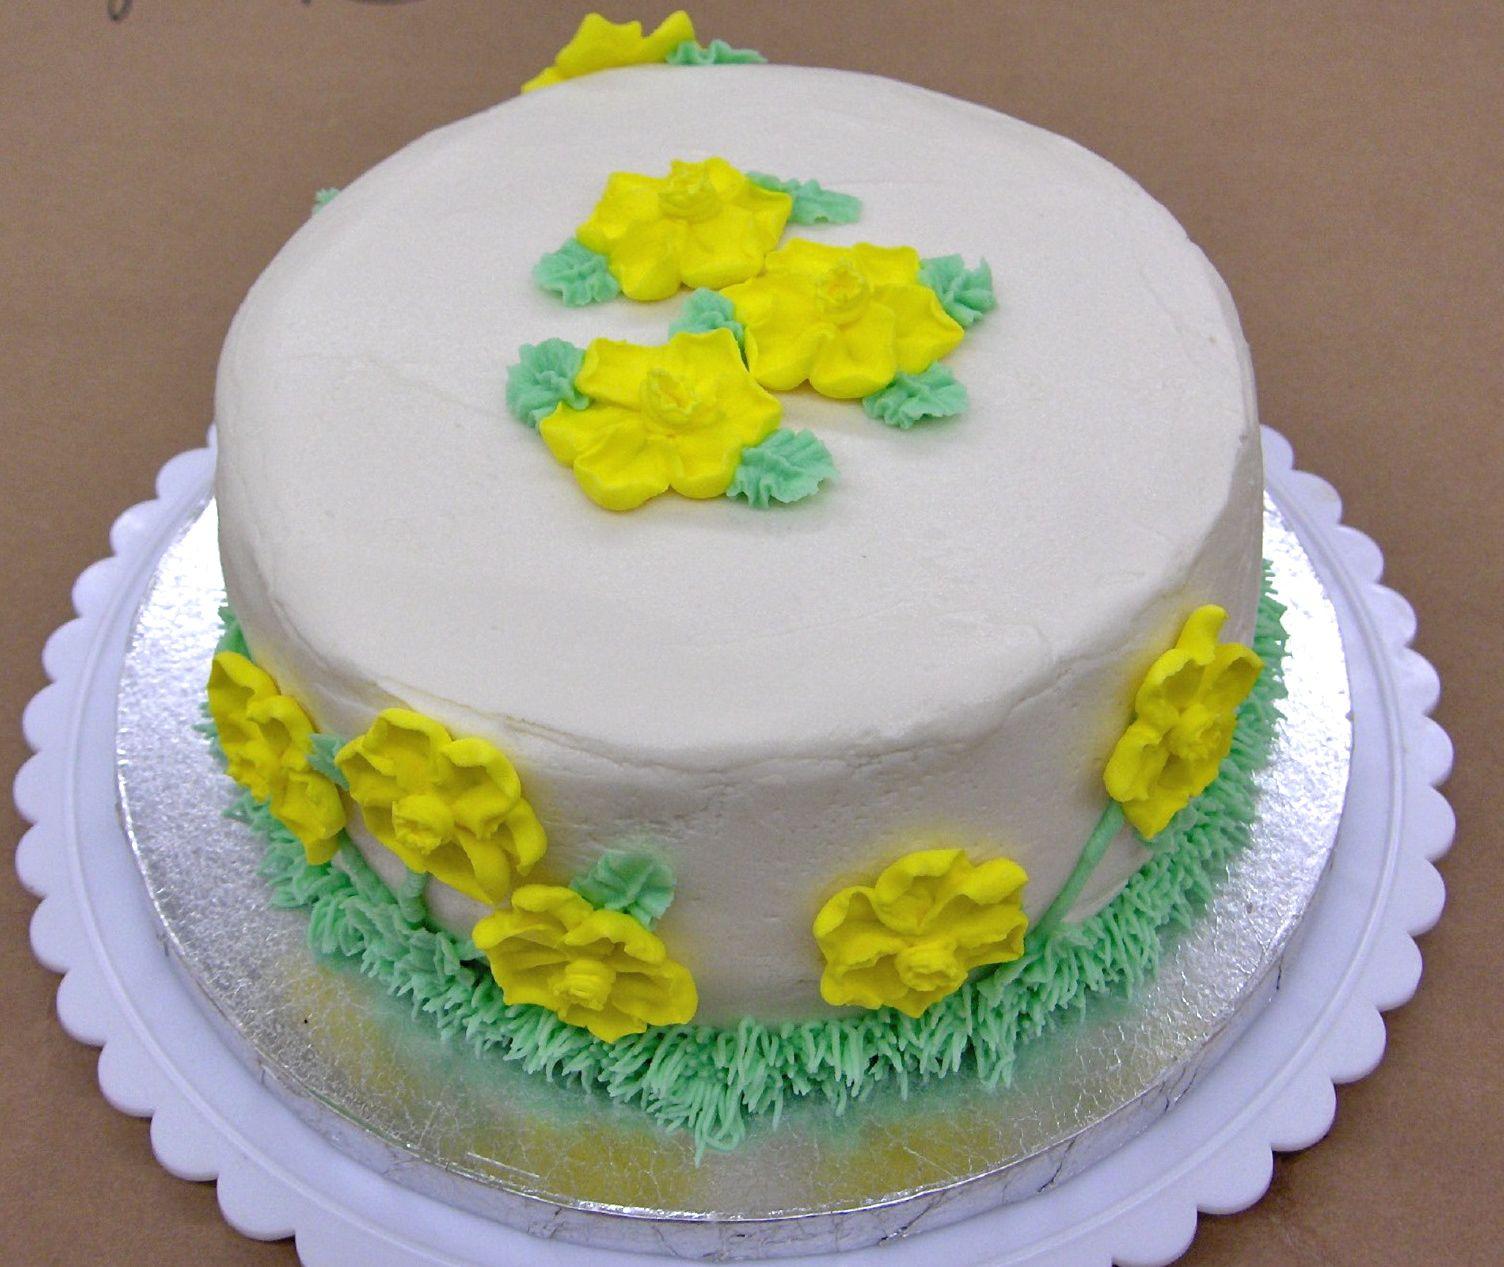 Rhapsody of Cacophony: Wilton Cake Class 2 - Final Cake